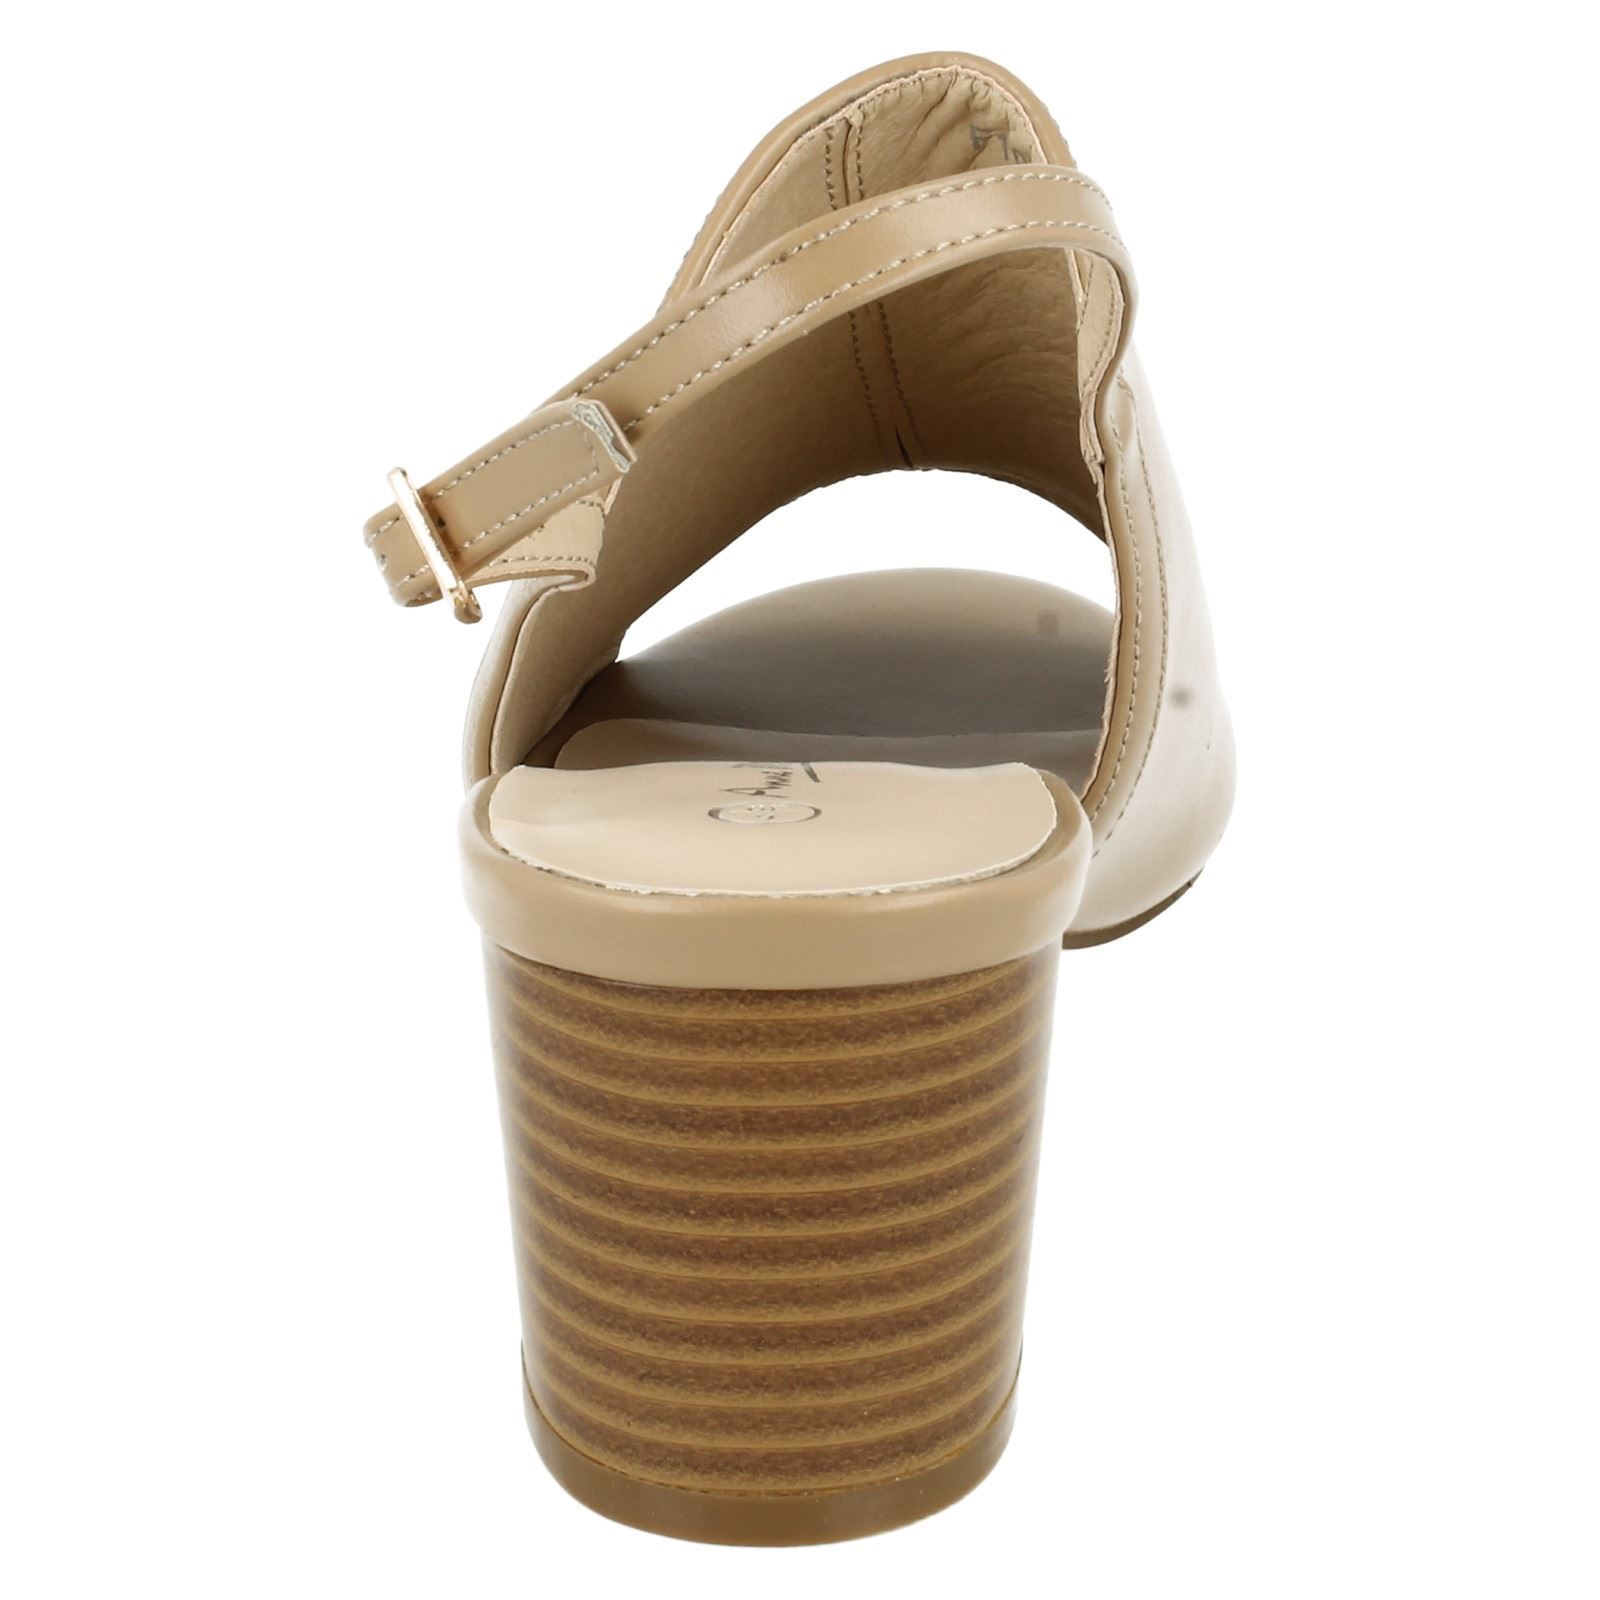 Damas Anne Michelle Talón Mediados Tribunal Zapatos Etiqueta-F10733